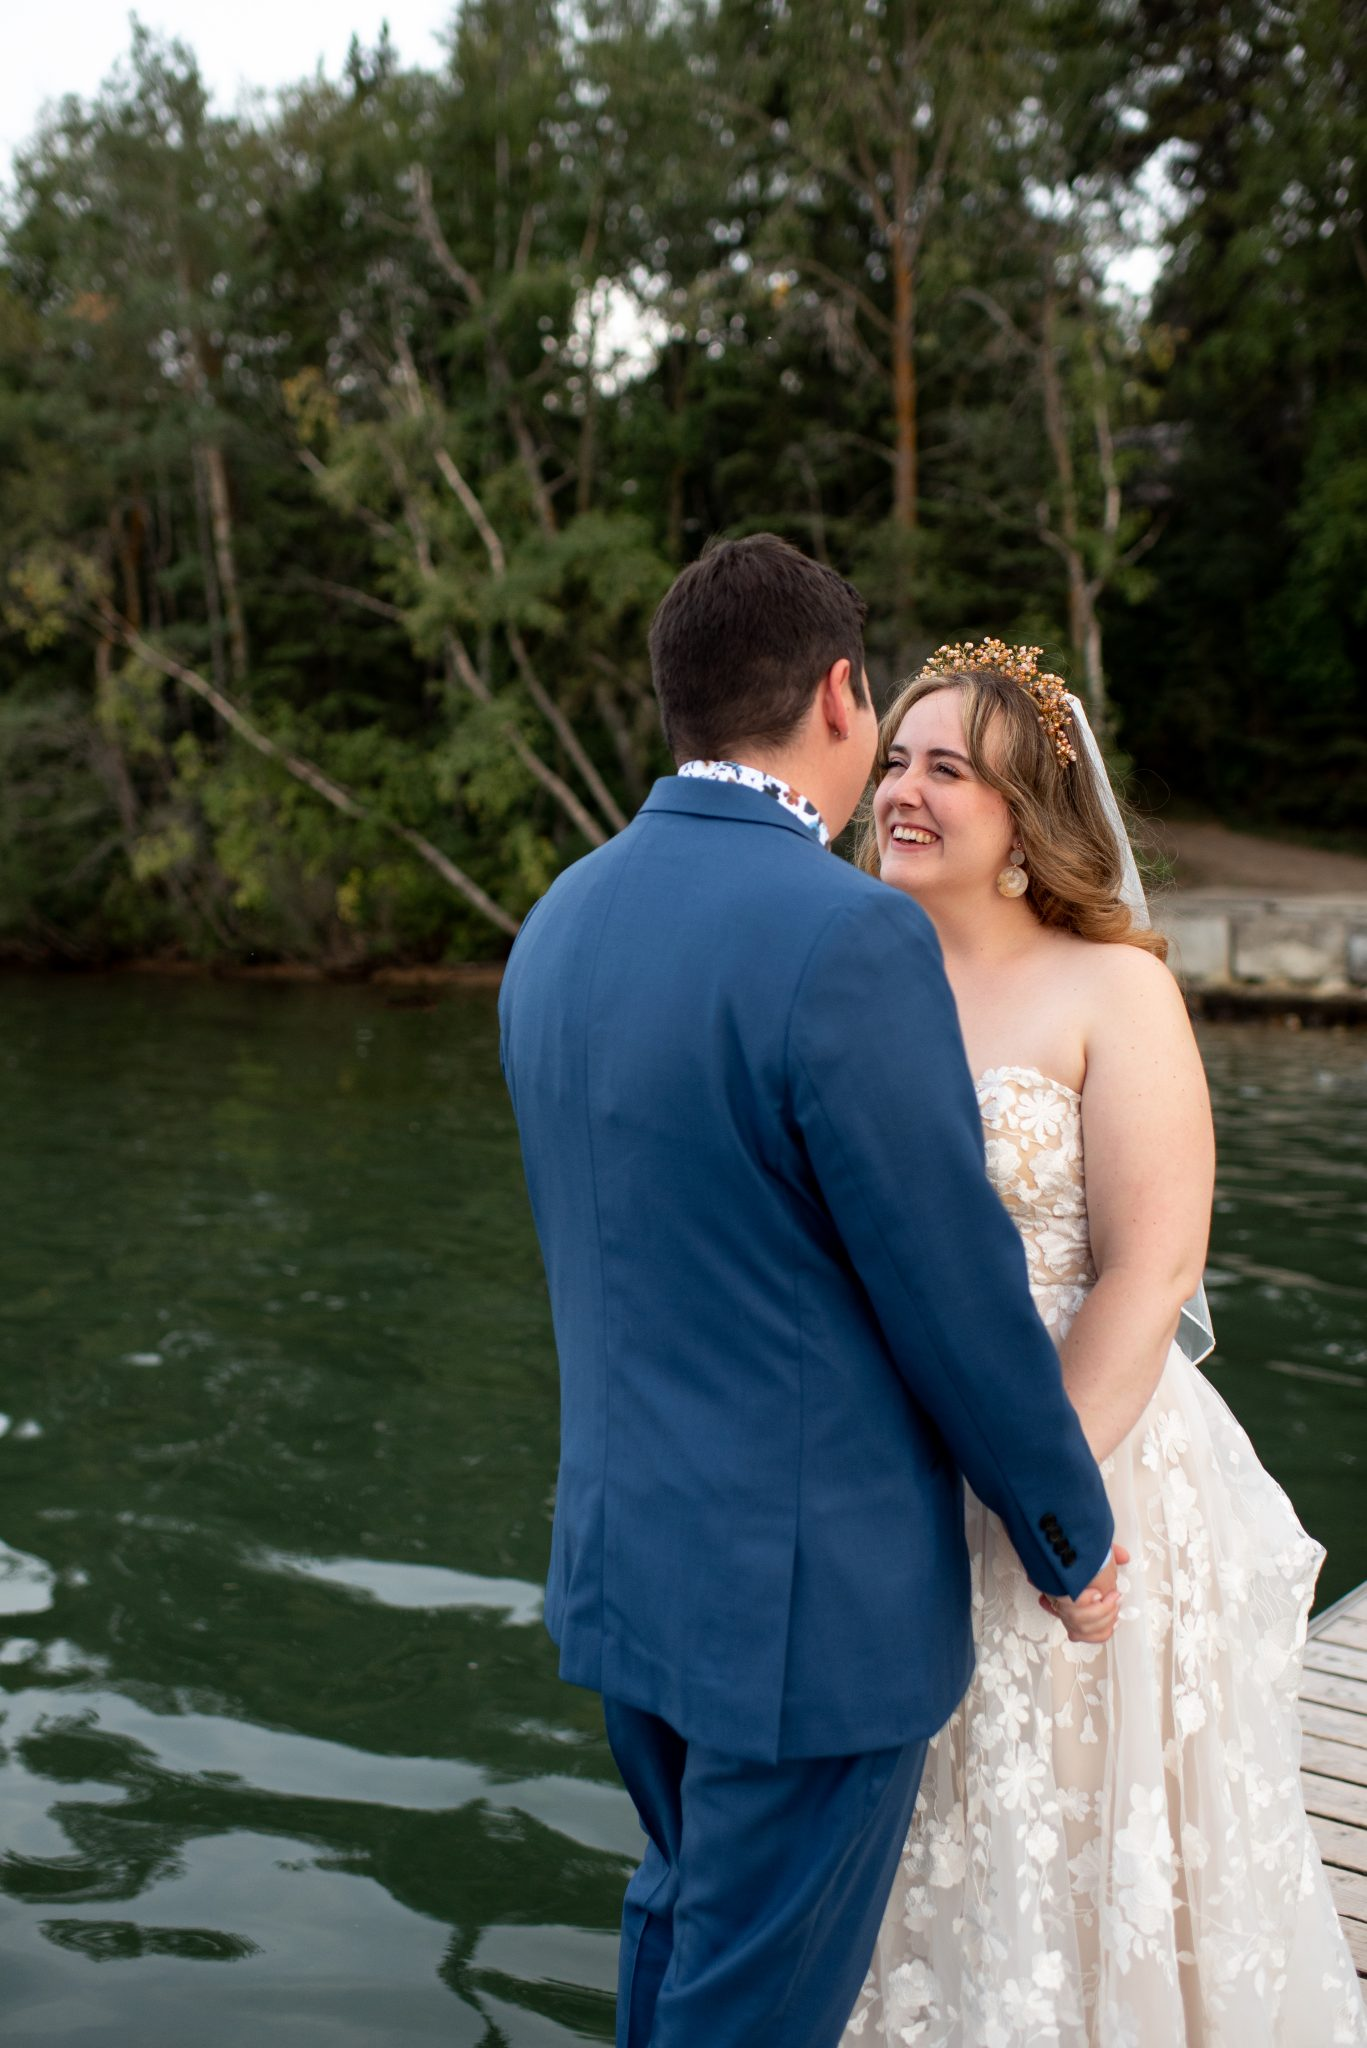 Lakeside wedding portraits for Alberta bride and groom at this Sylvan Lake wedding